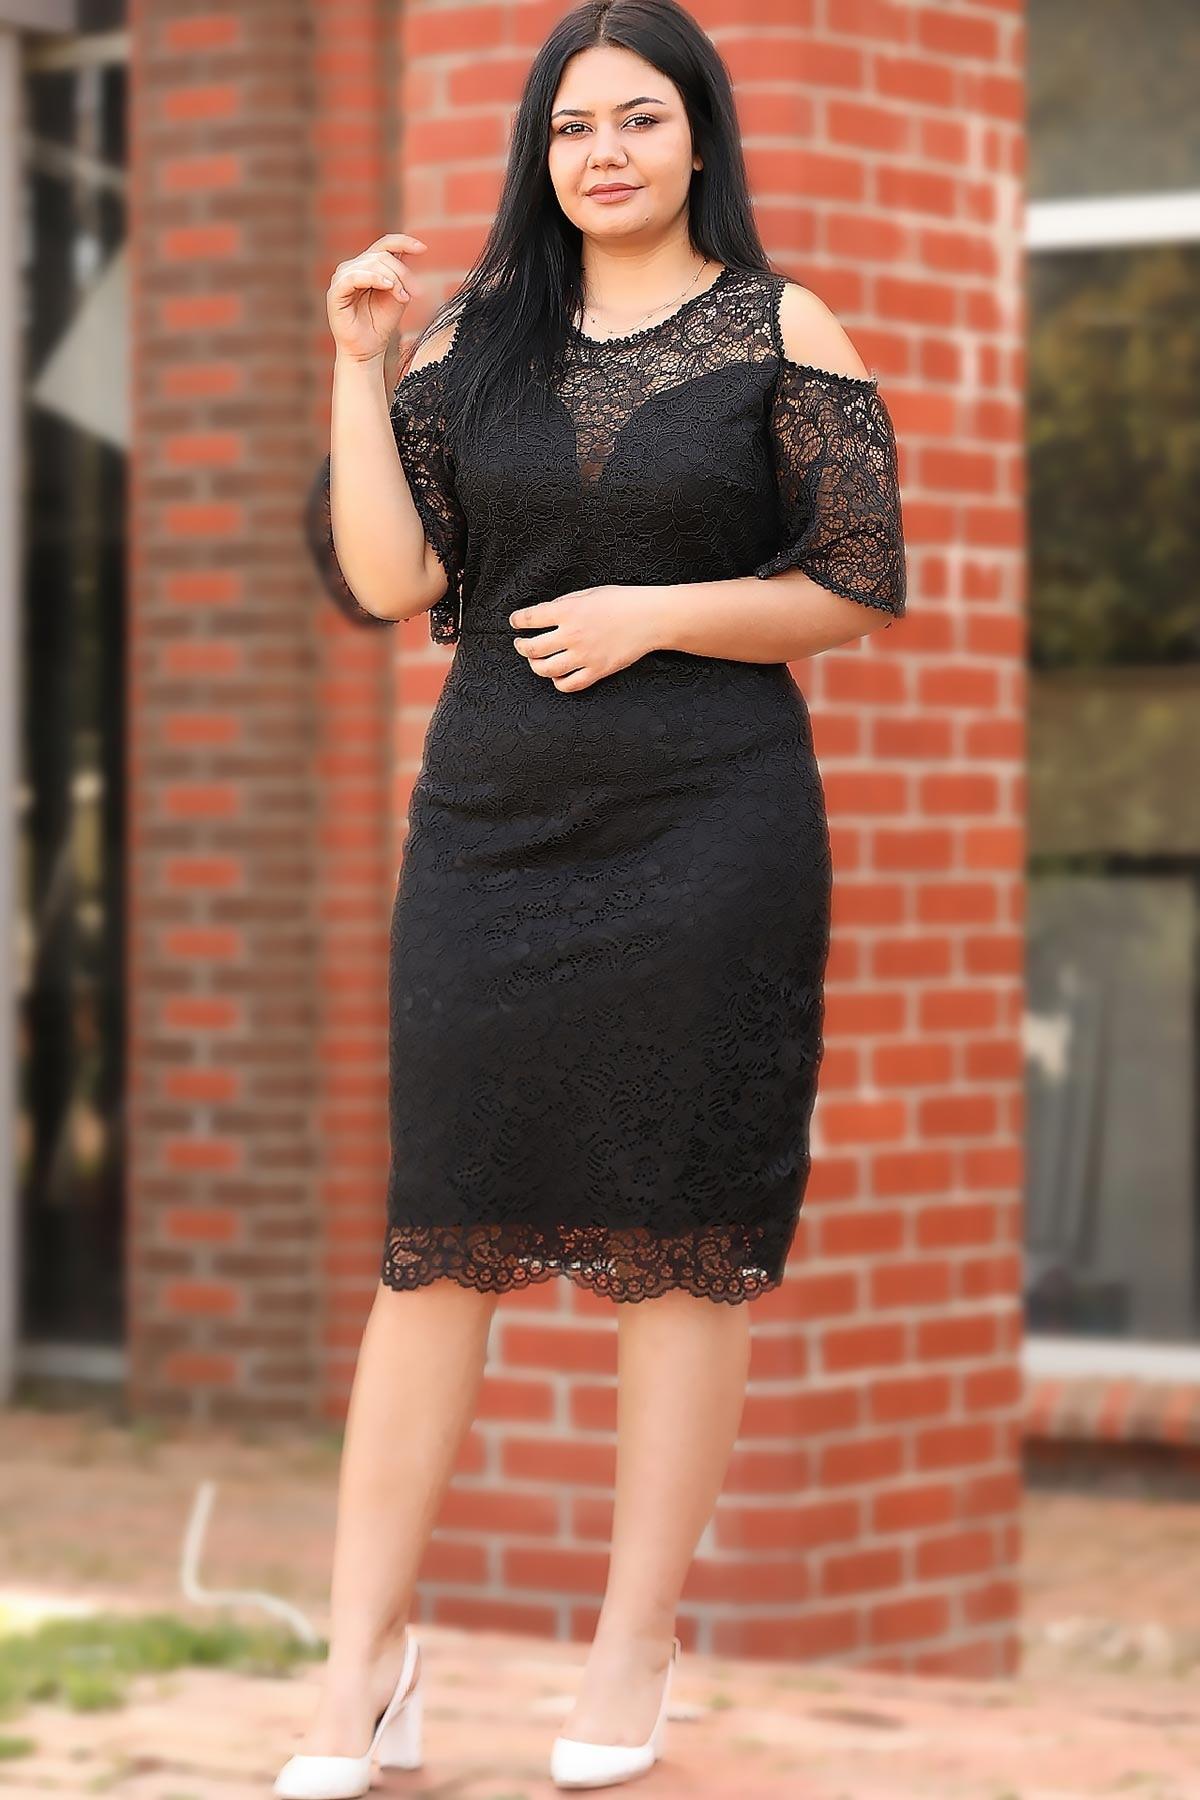 LARGE SIZE SHORT ABİYE DRESS dress 2021 summer dress woman's dress casual women's dresses for special occasions dress фото